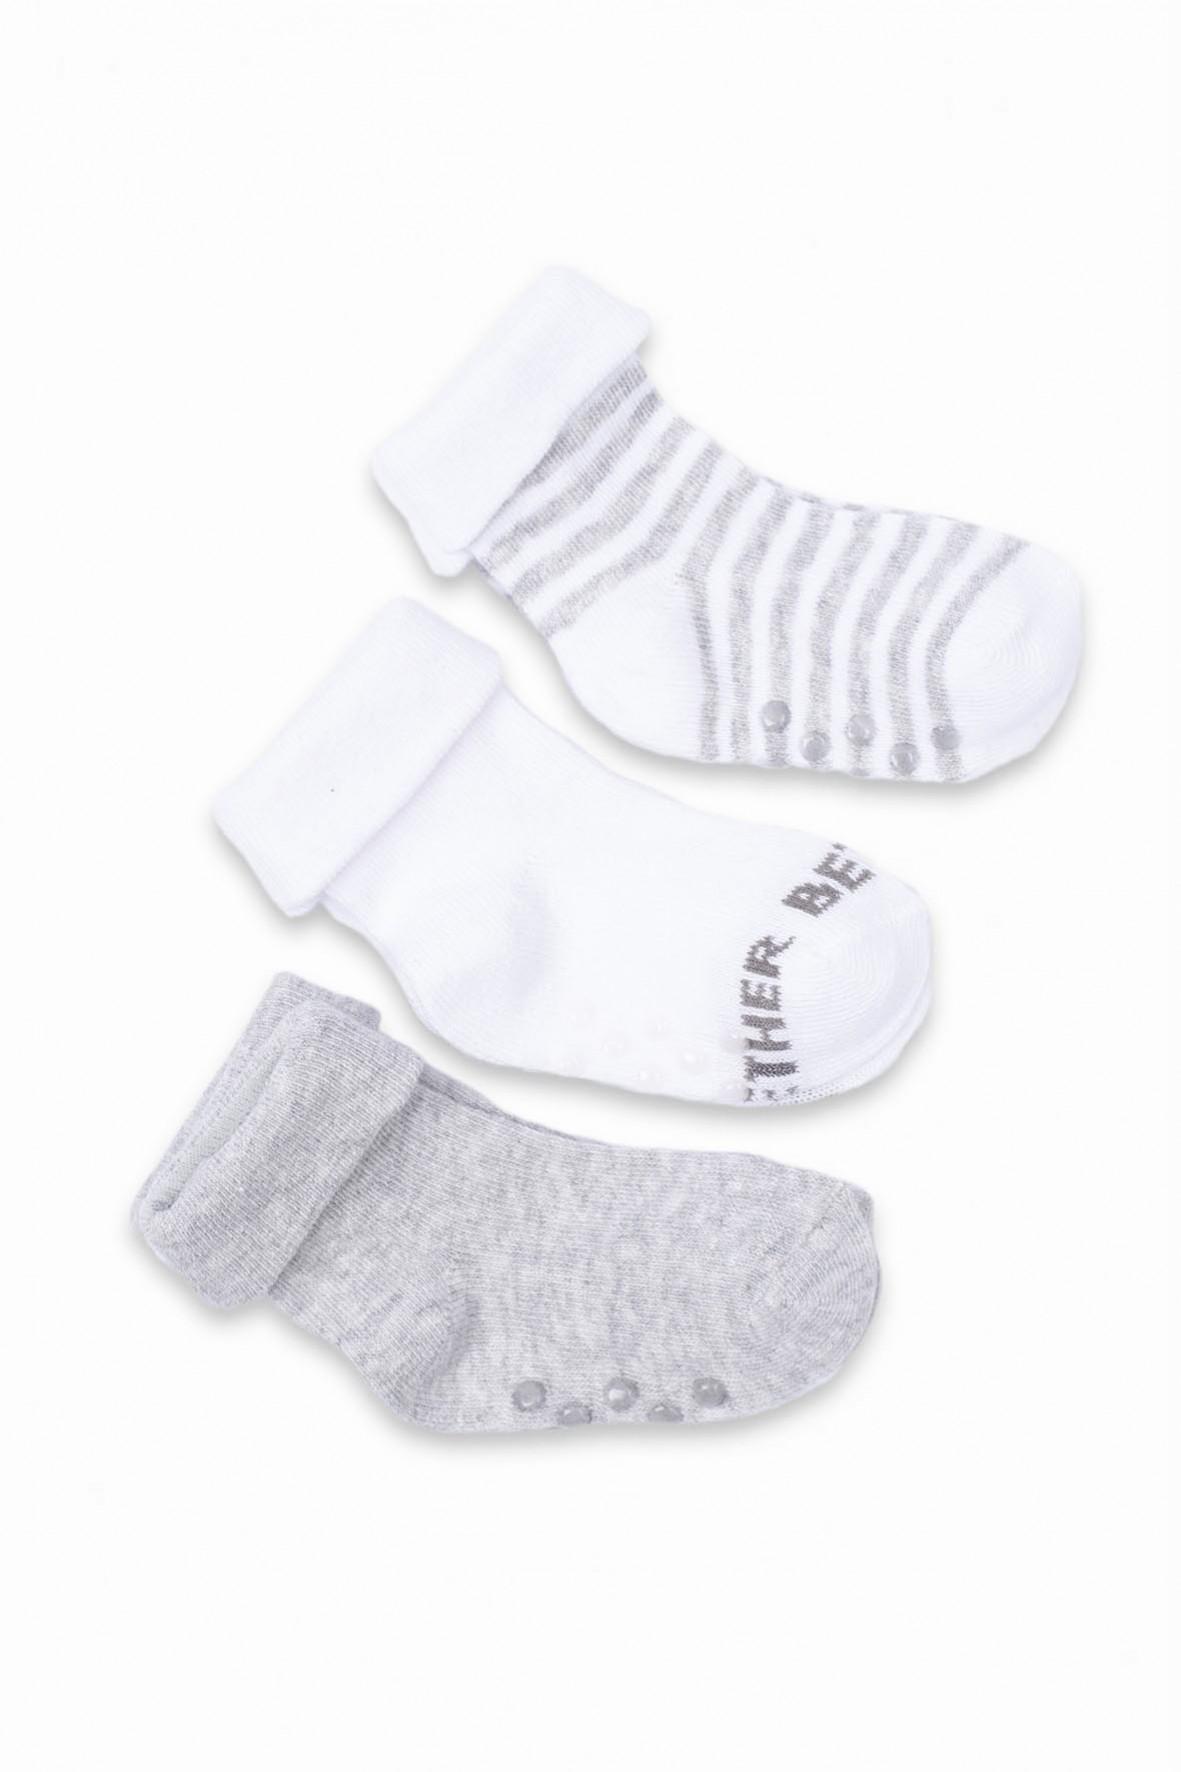 Skarpetki niemowlęce antypoślizgowe 3 pak